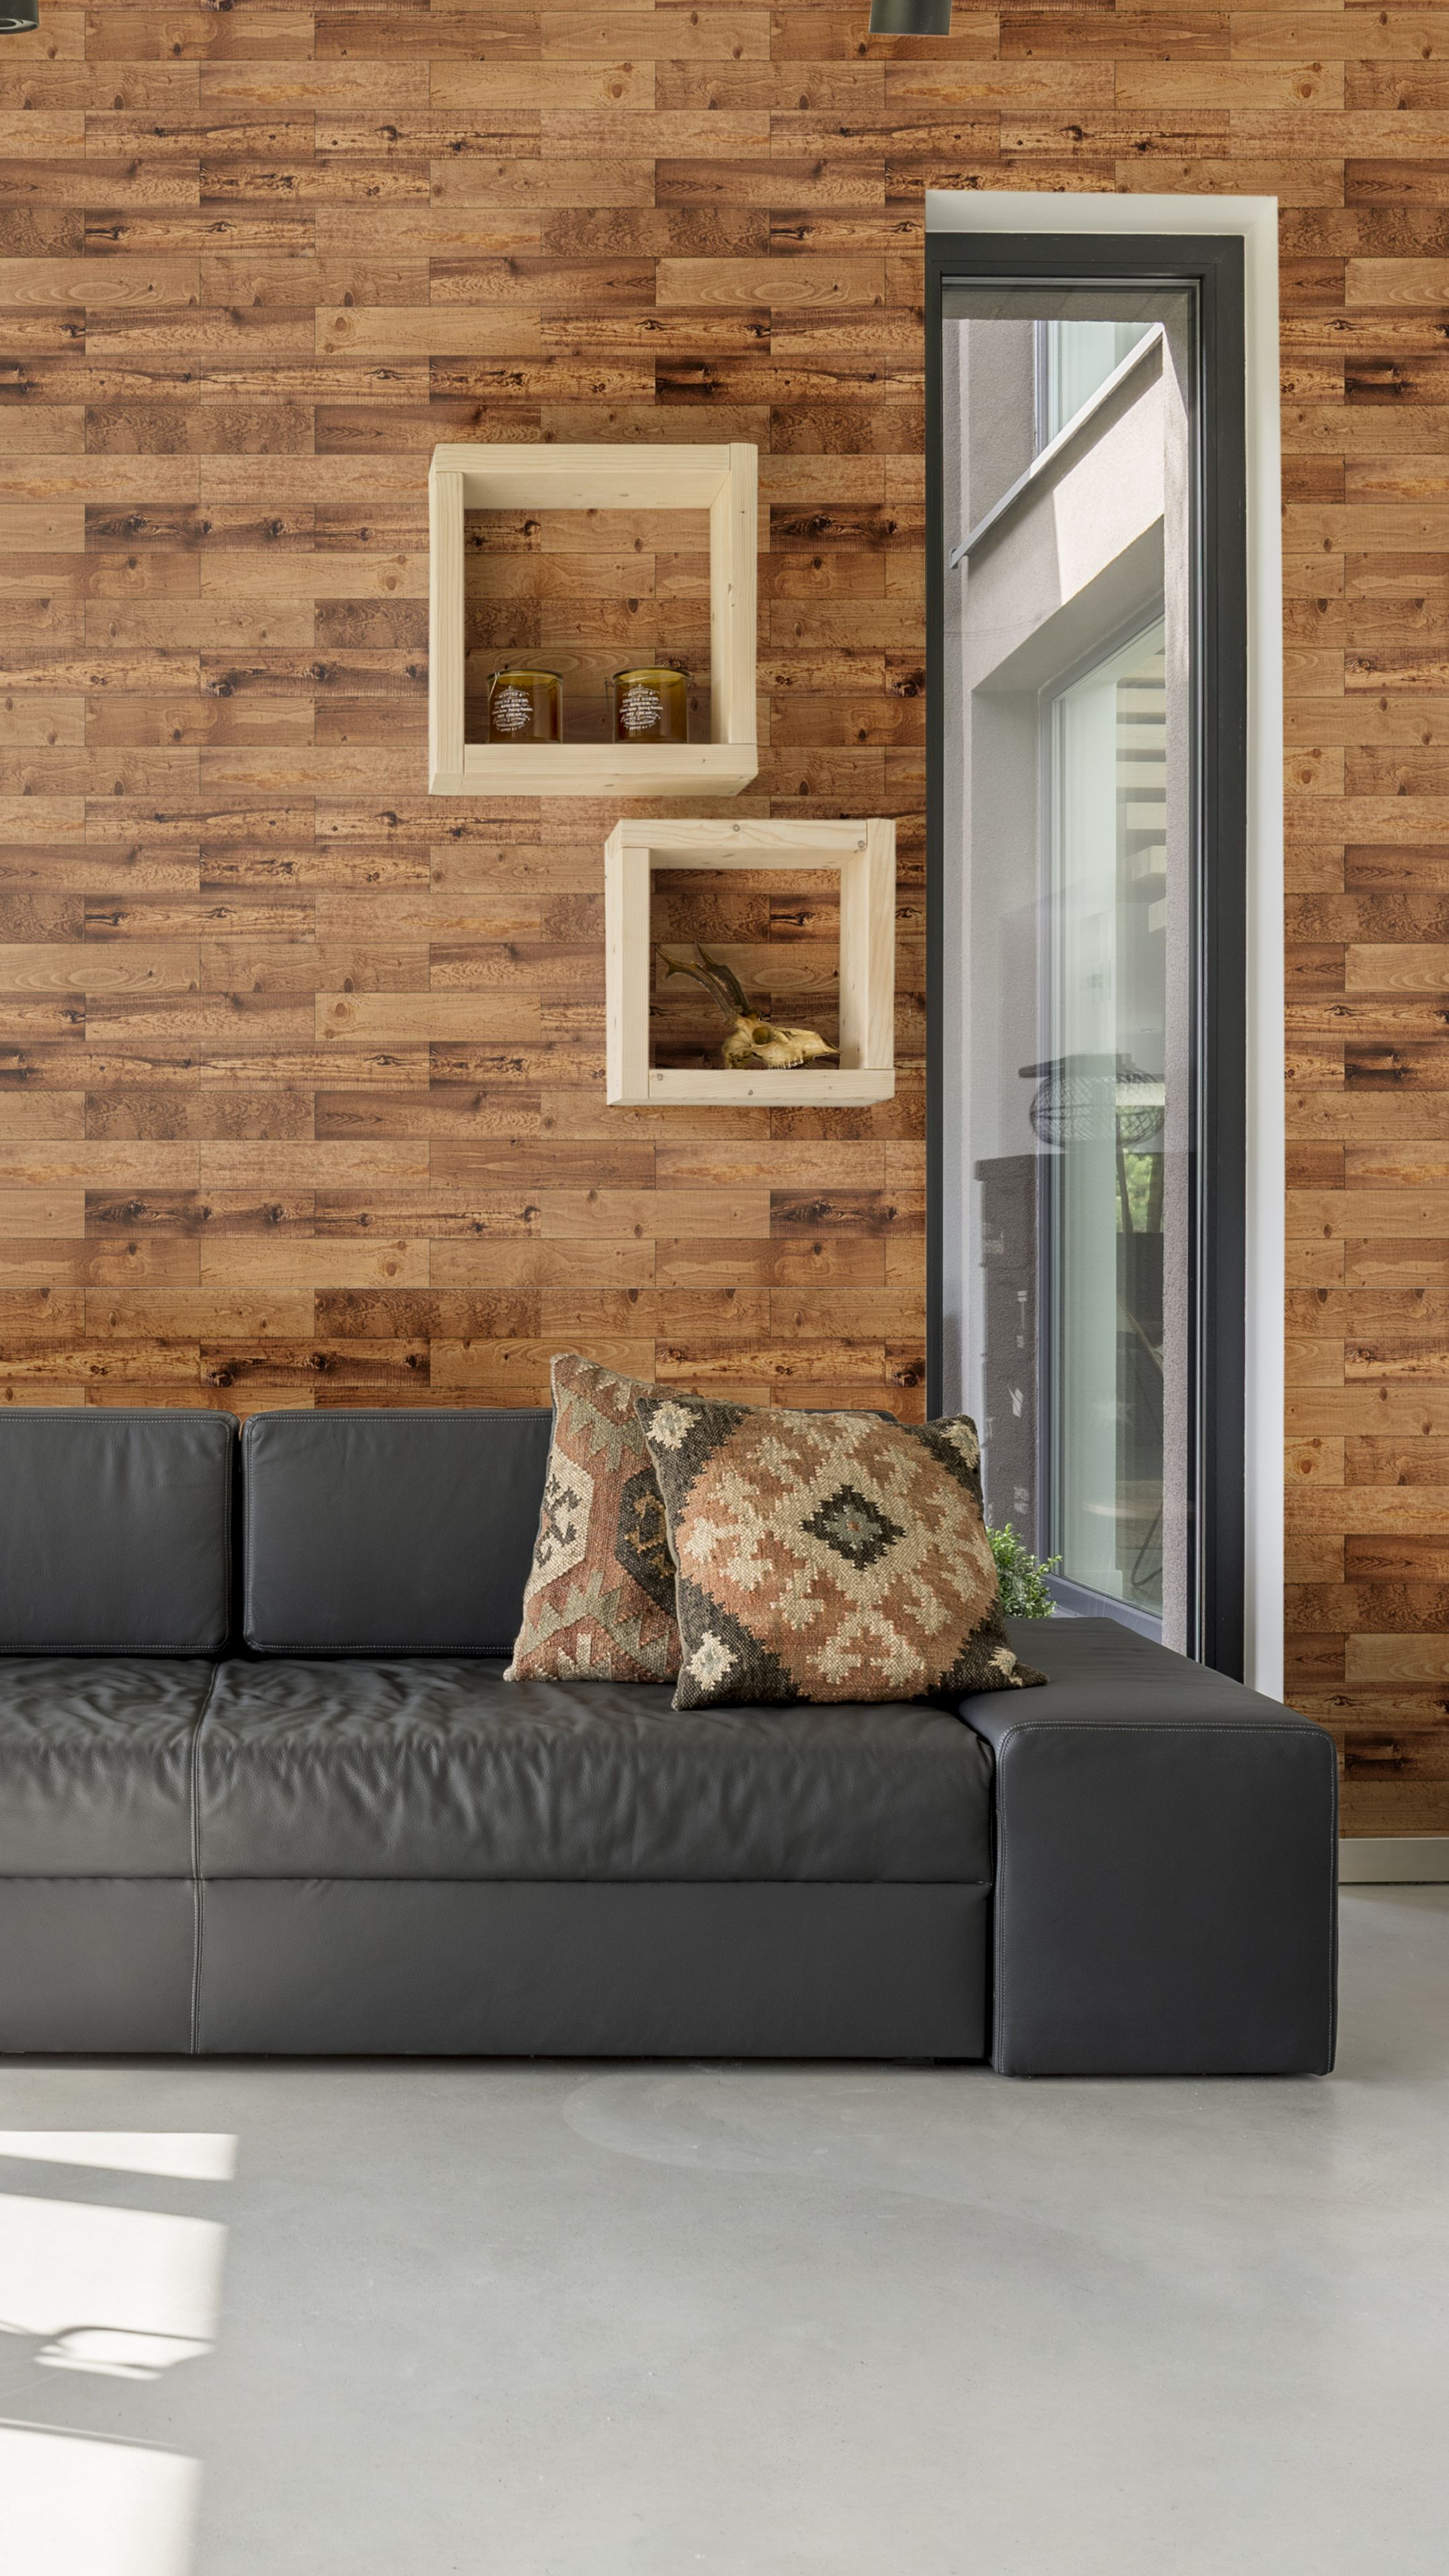 3d Uneven Wood Grain Wallpaper Removable Self Adhesive Etsy Wood Grain Wallpaper Stick On Wood Wall Wood Wallpaper